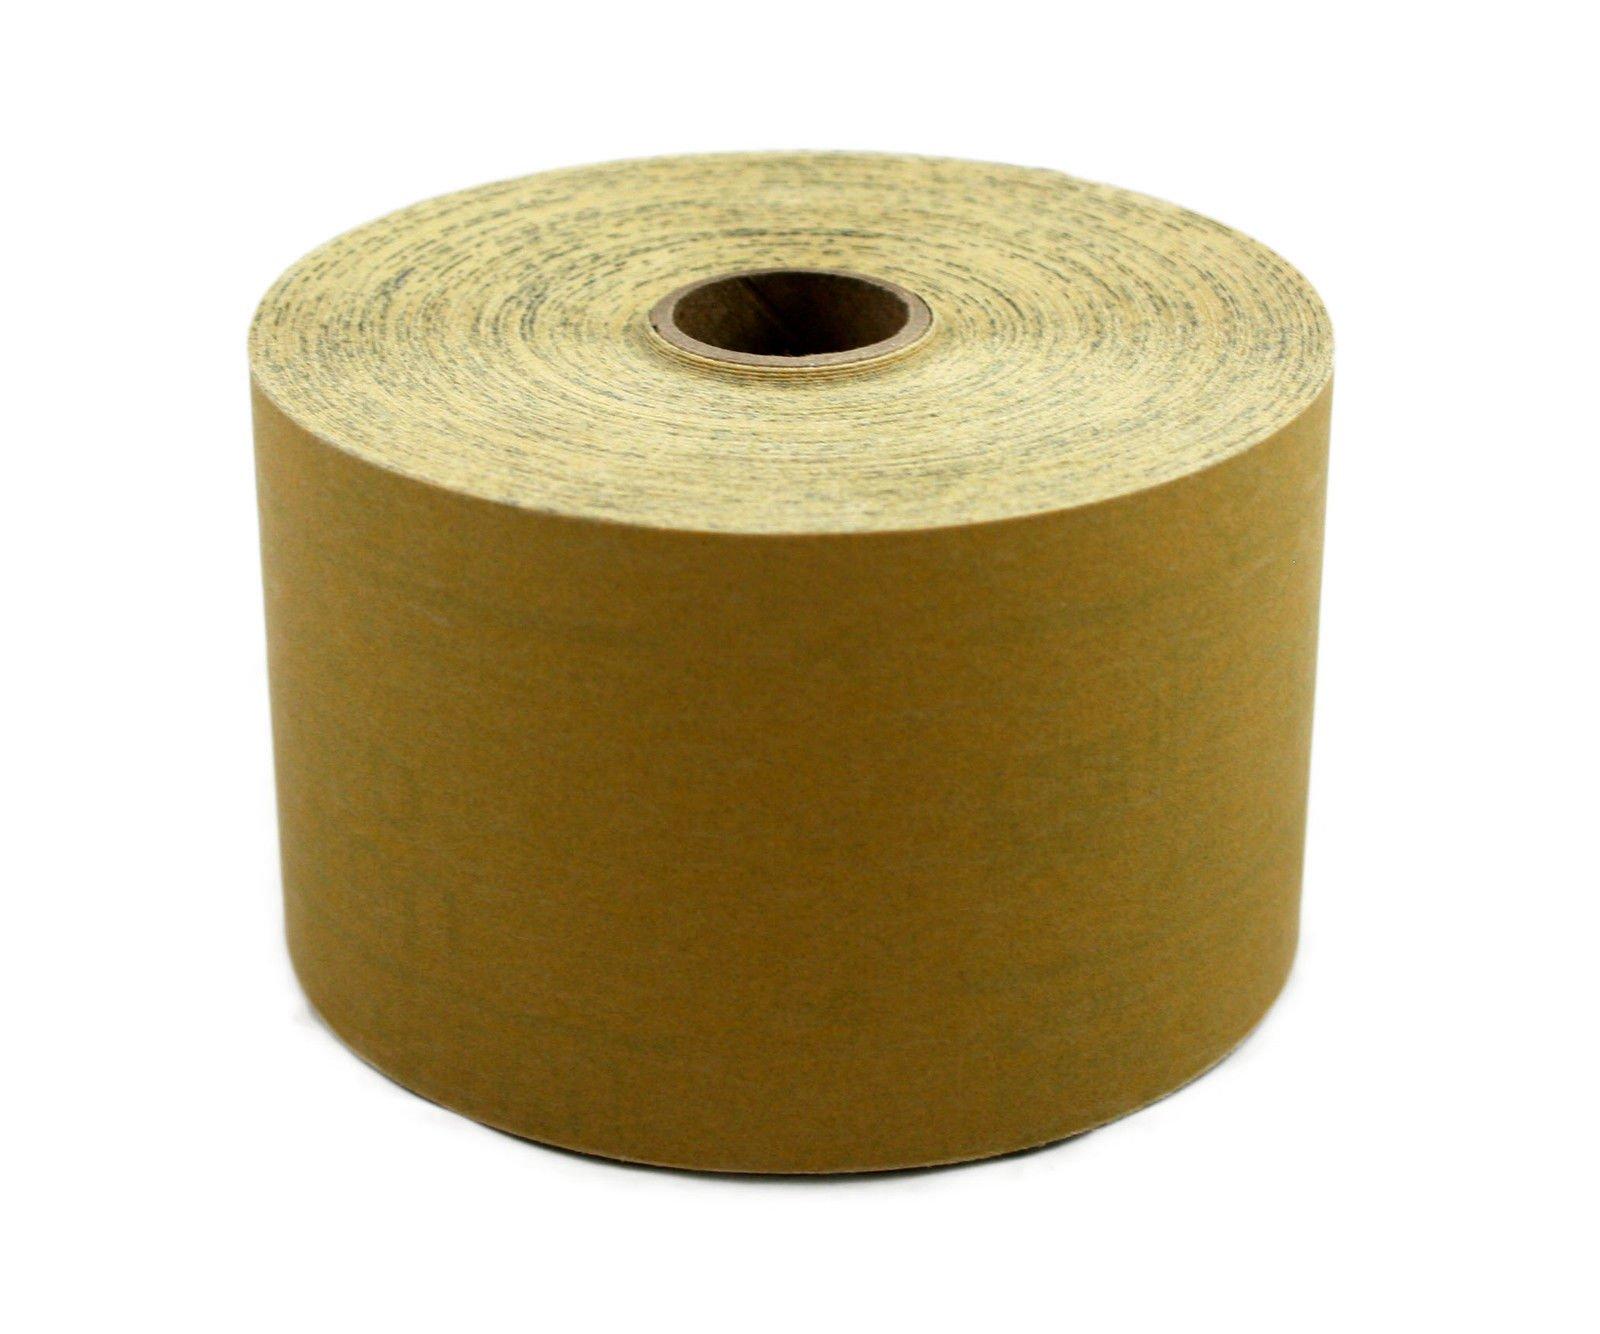 3M 2590 Stikit Gold Roll P400 Sandpaper-Dura-Block-Sand